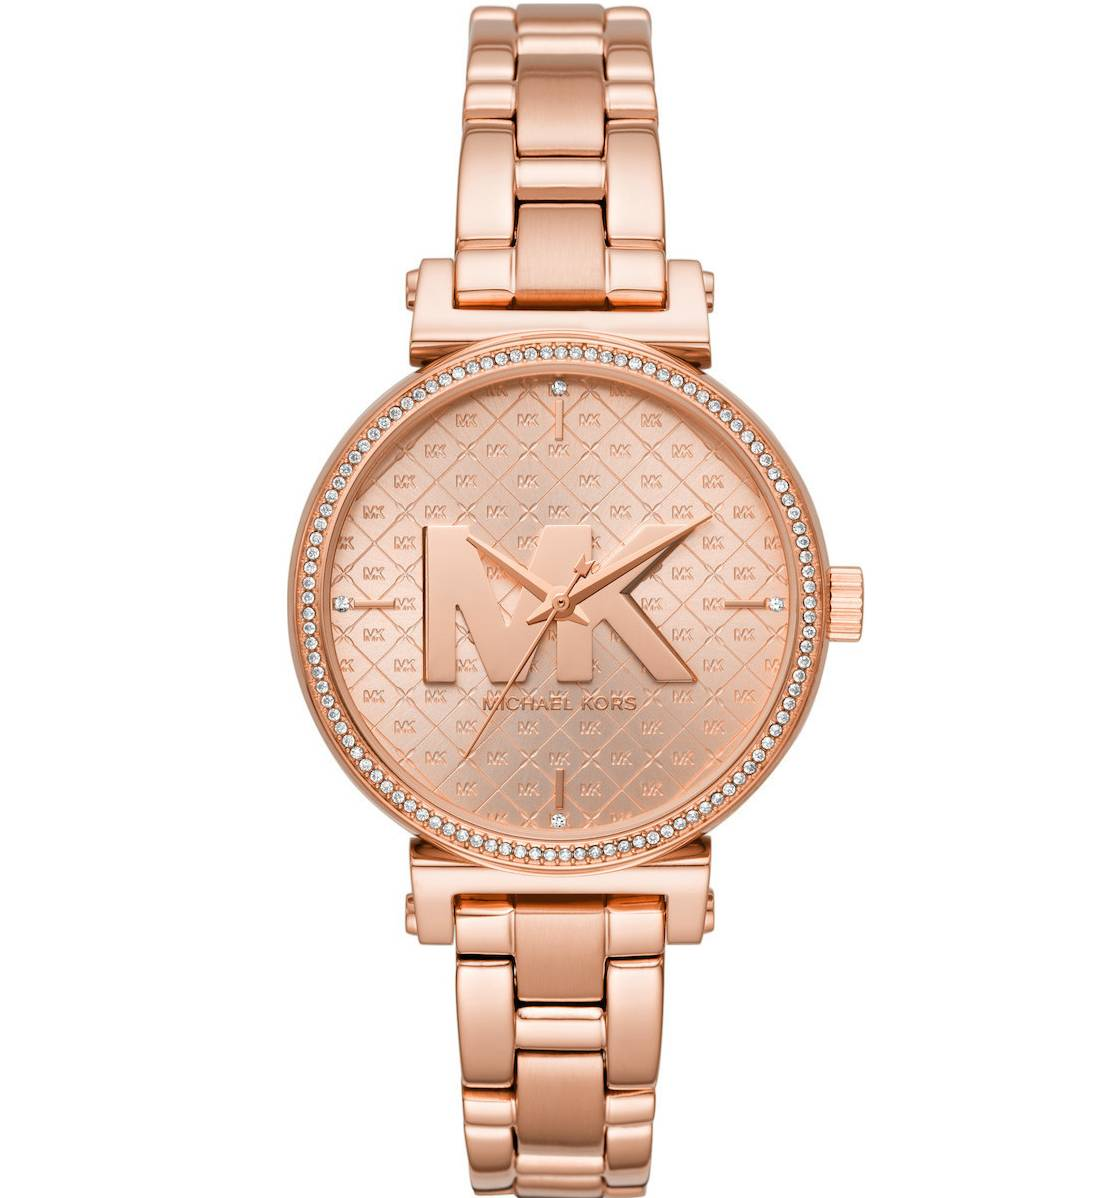 Relógio Michael Kors Feminino Quartz MK4335/1JI